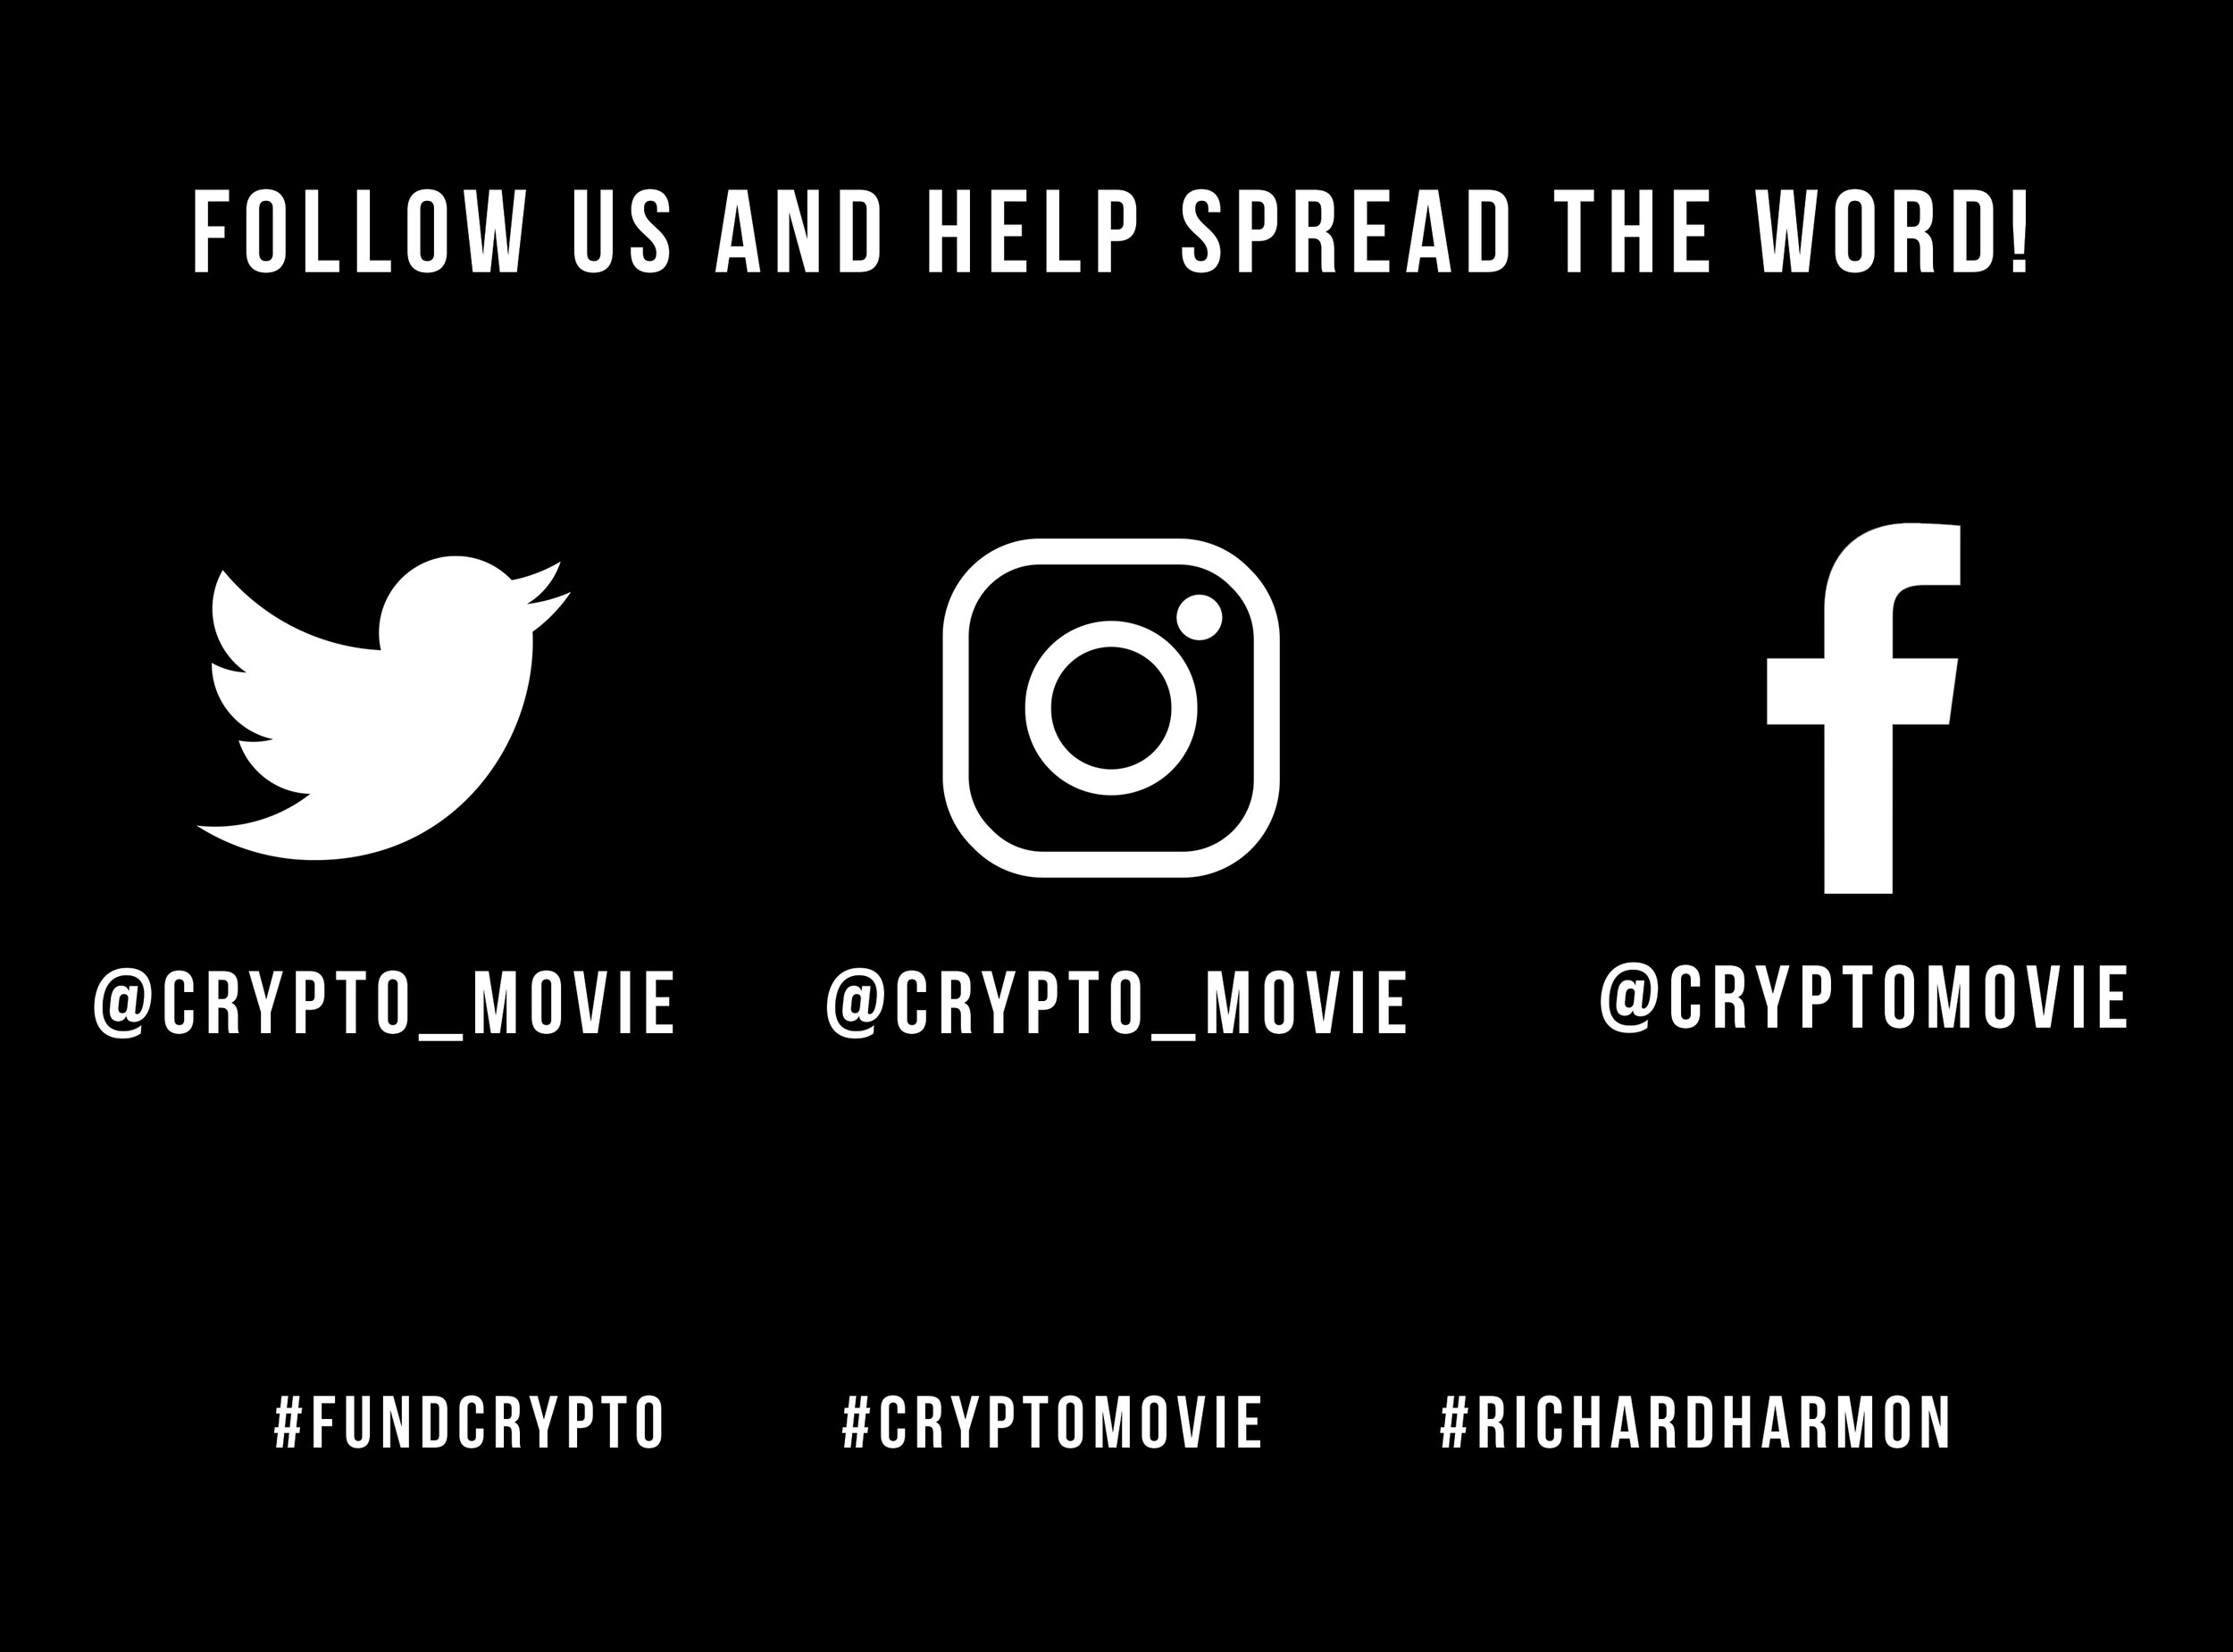 Crypto_Indiegogo_SocialMediaPages copy copy2.jpg